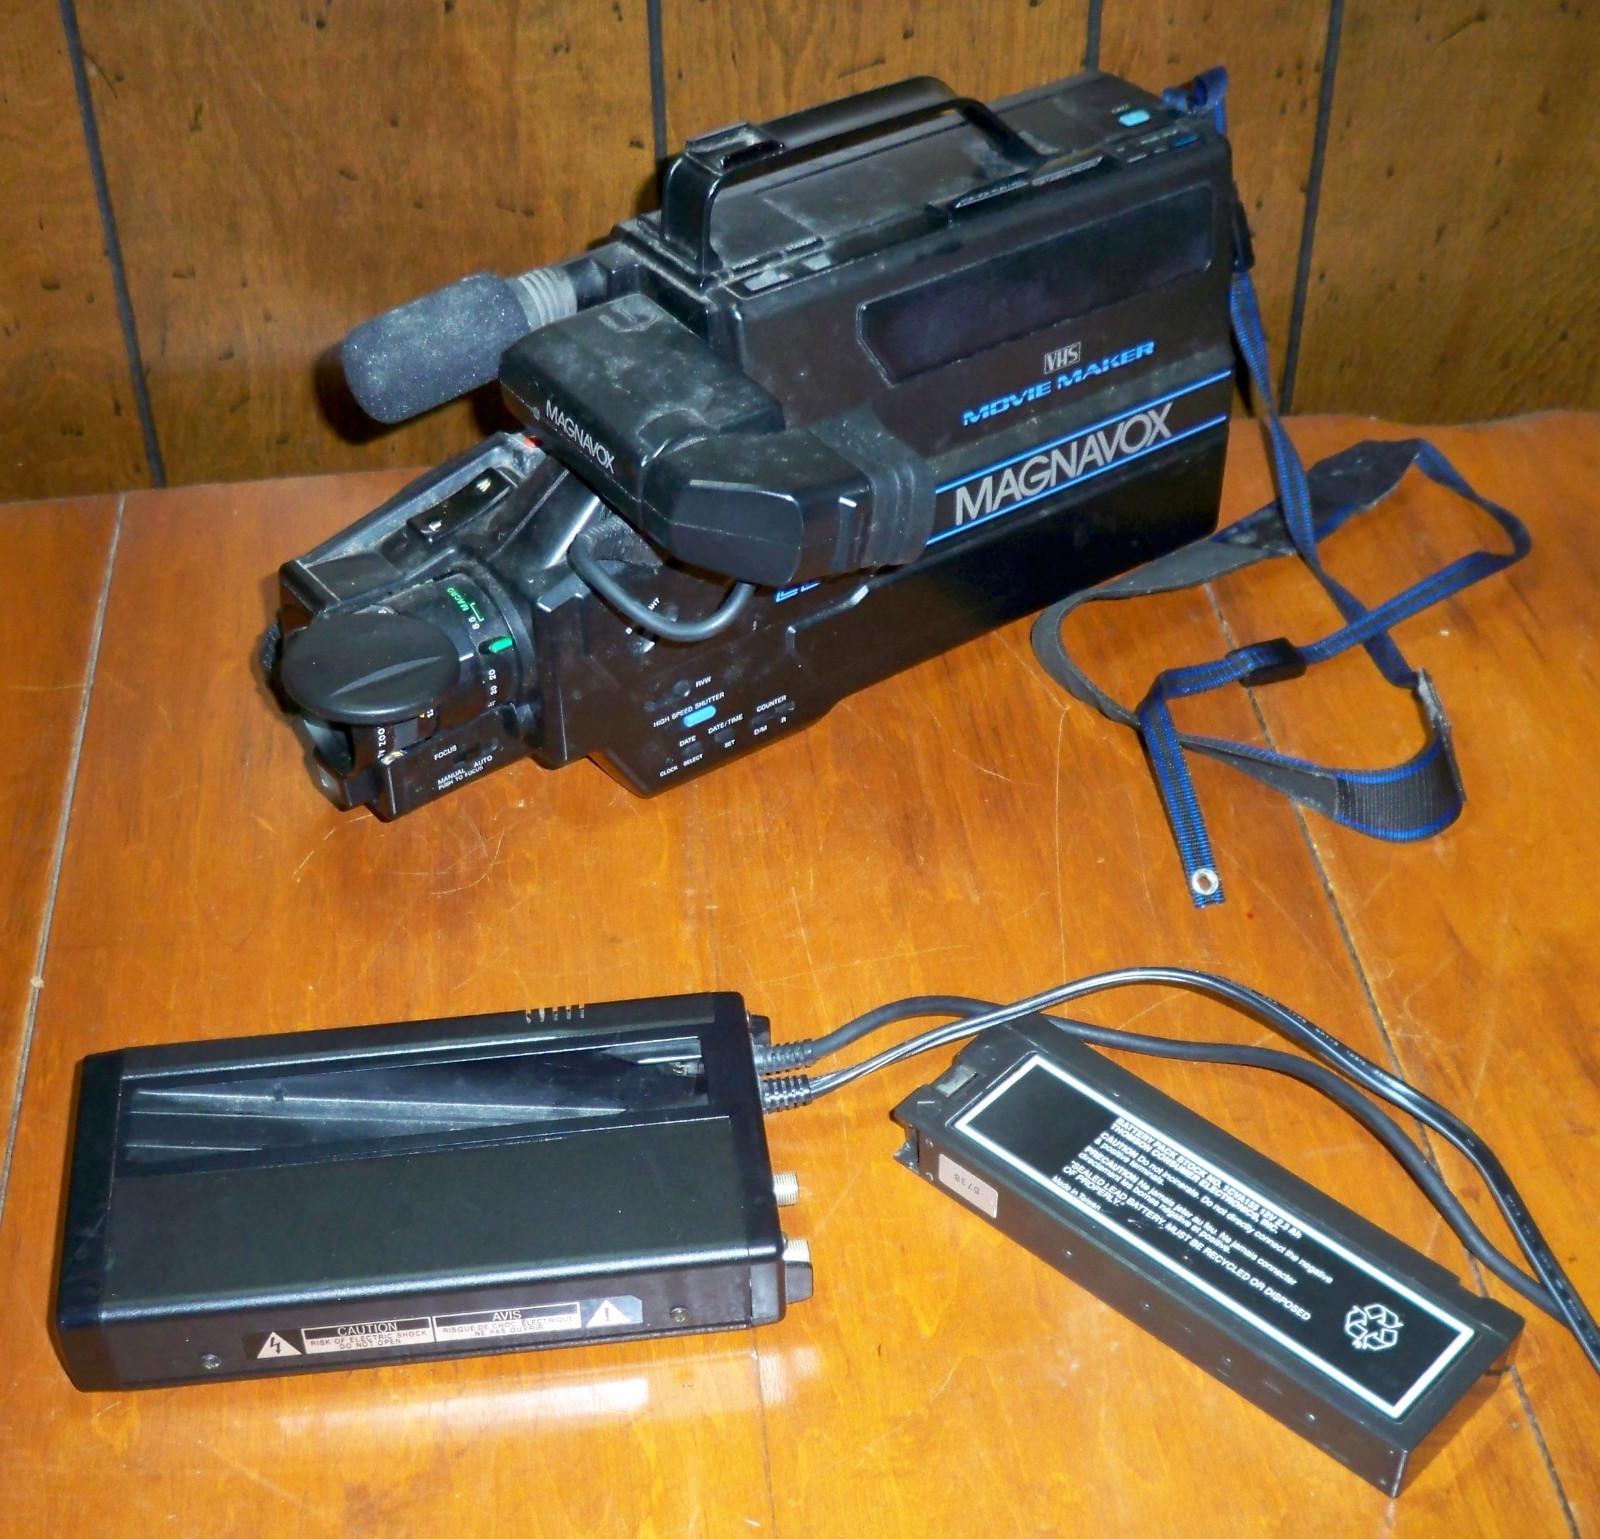 Magnavox CCD Moviemaker VHS Camcorder and and 50 similar items